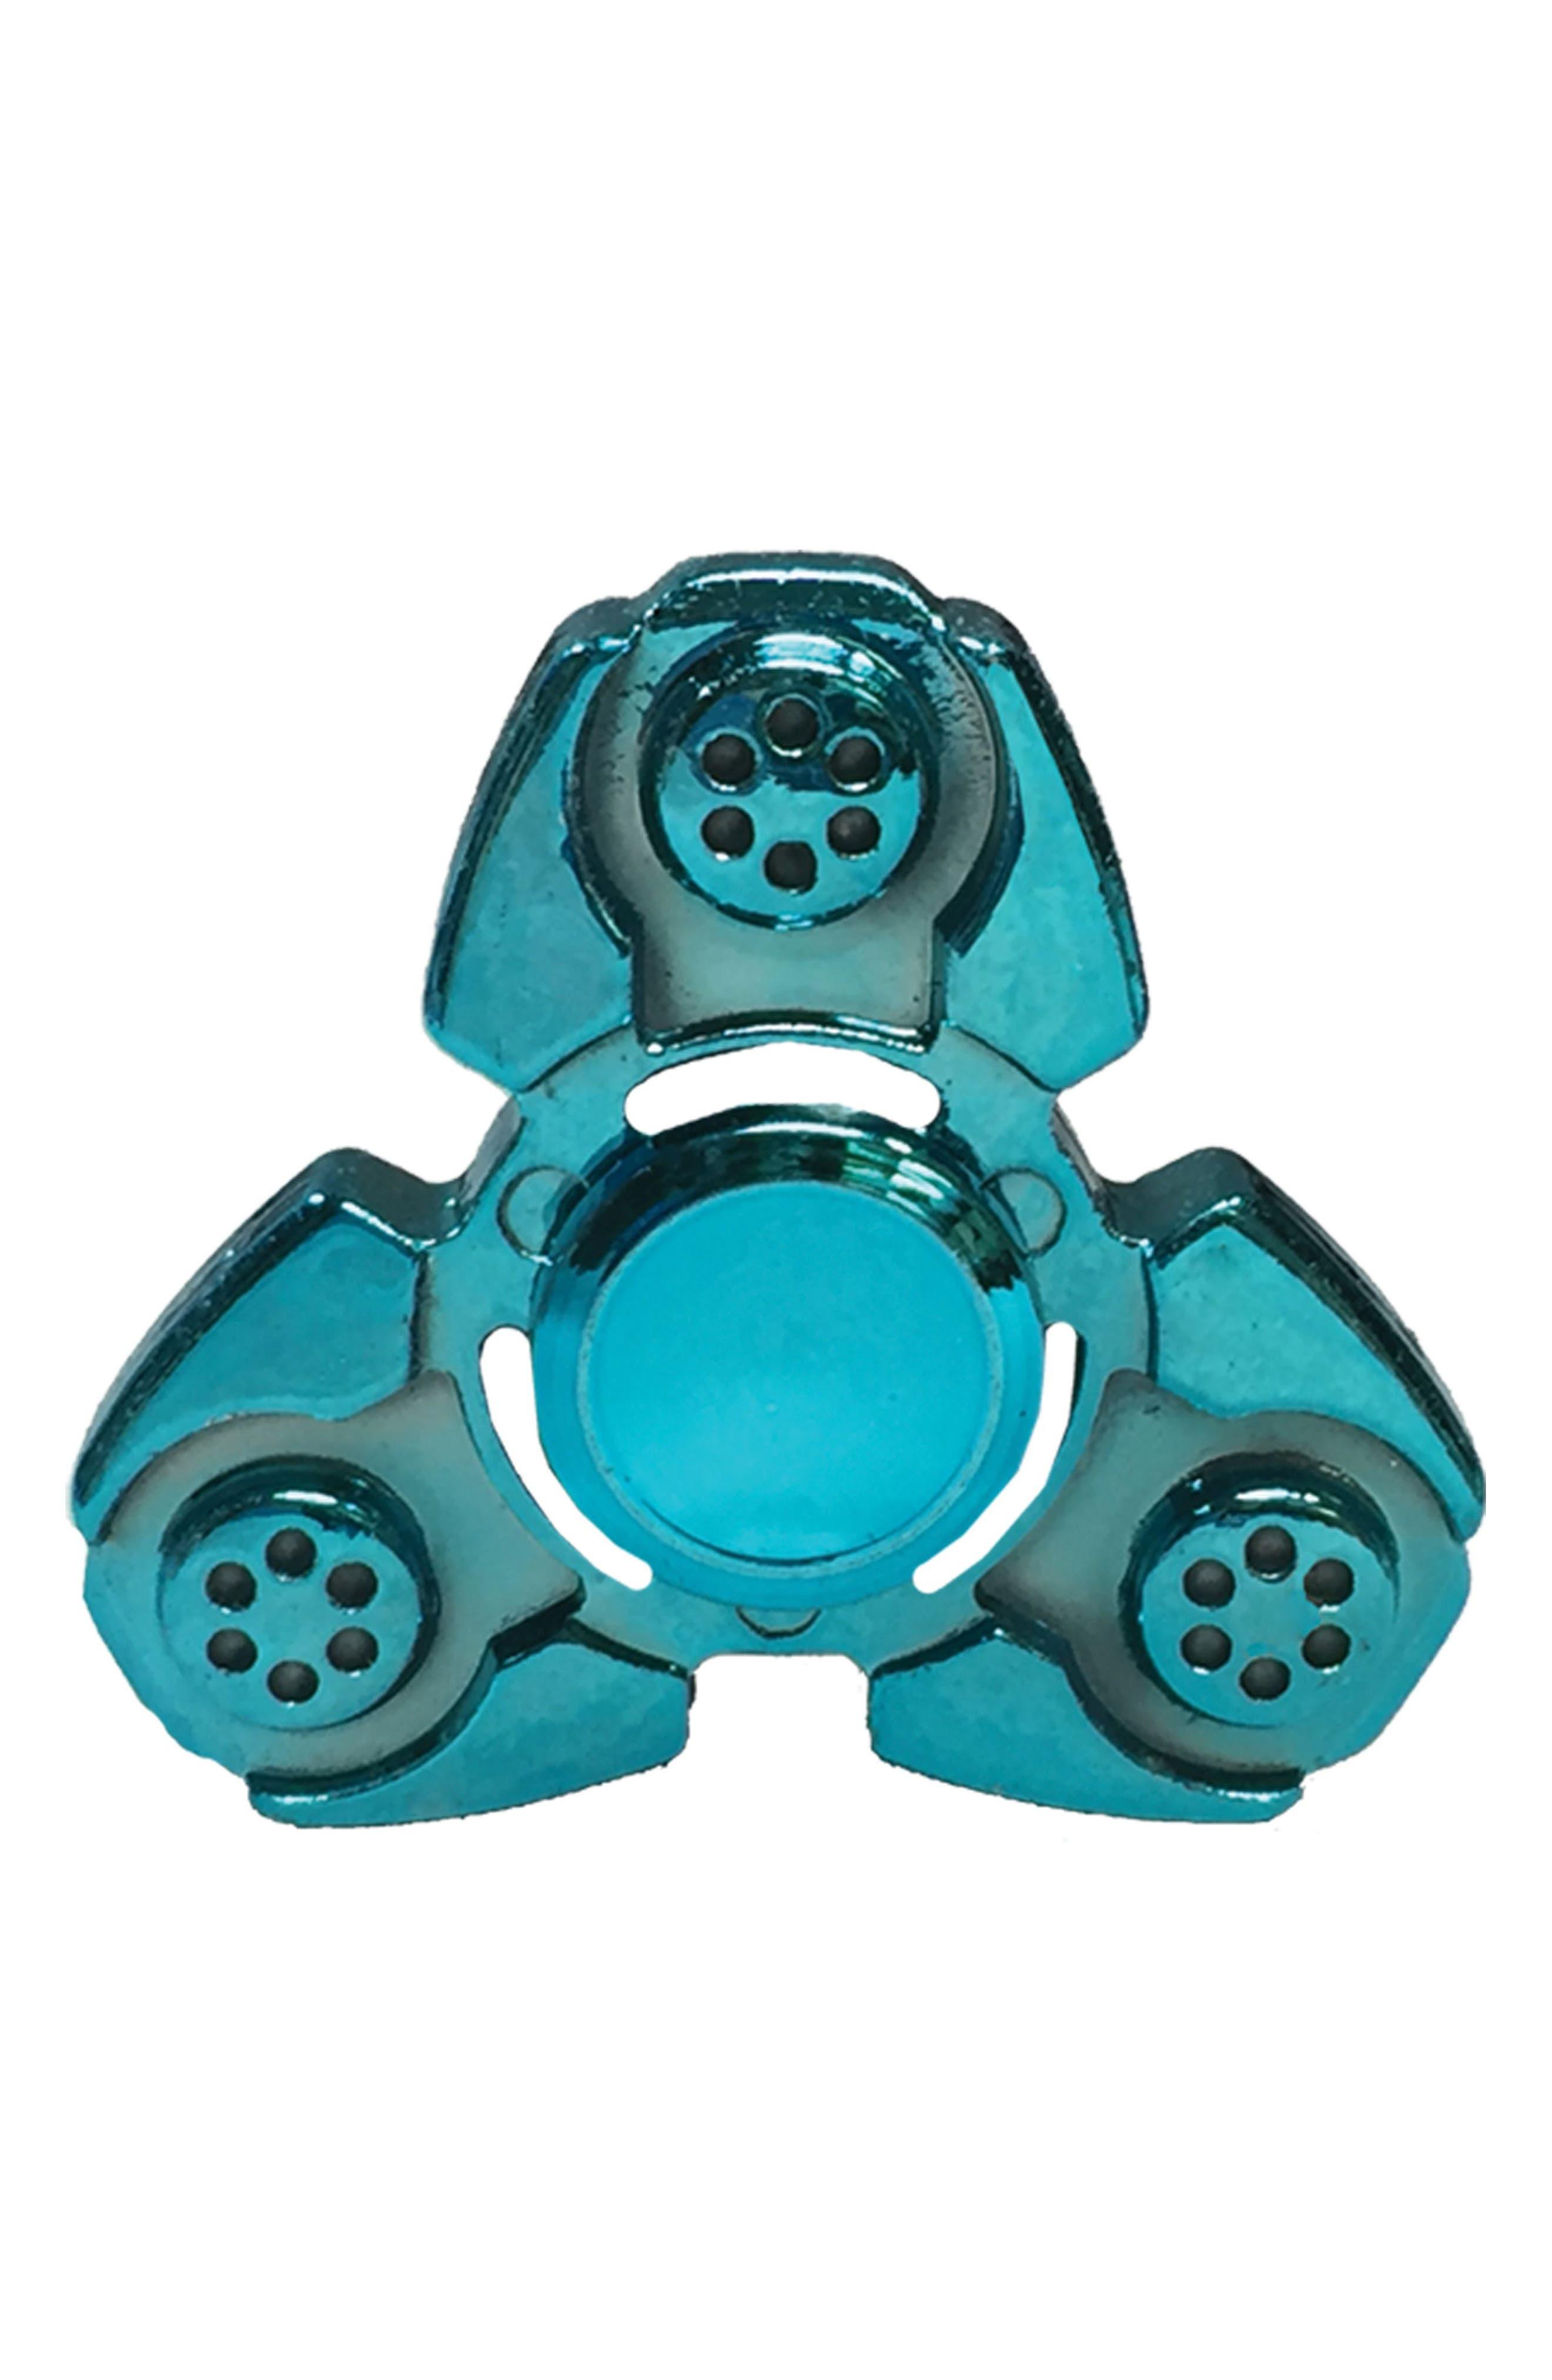 Jeannie's Enterprises Final Frontier Fidget Spinner